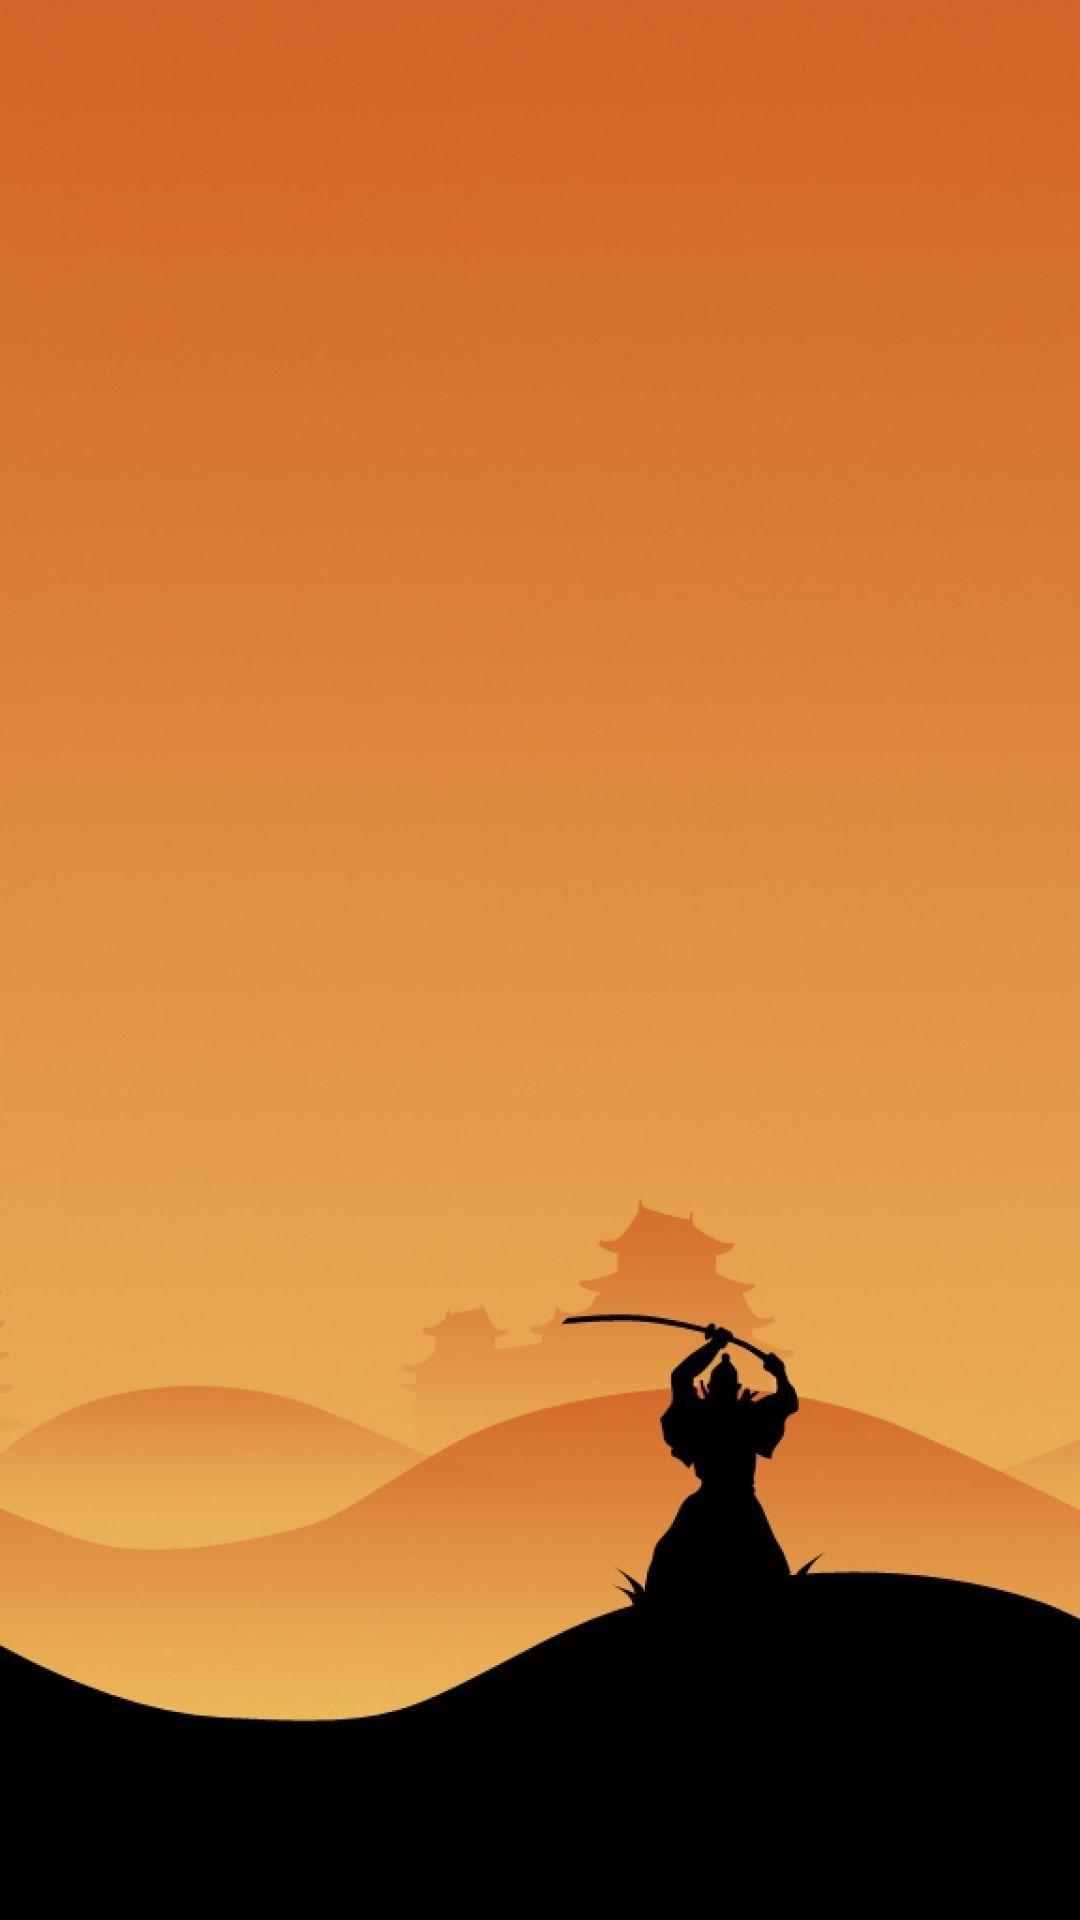 1080x1920 Wallpaper Samurai Night Silhouette Fotos Pintura